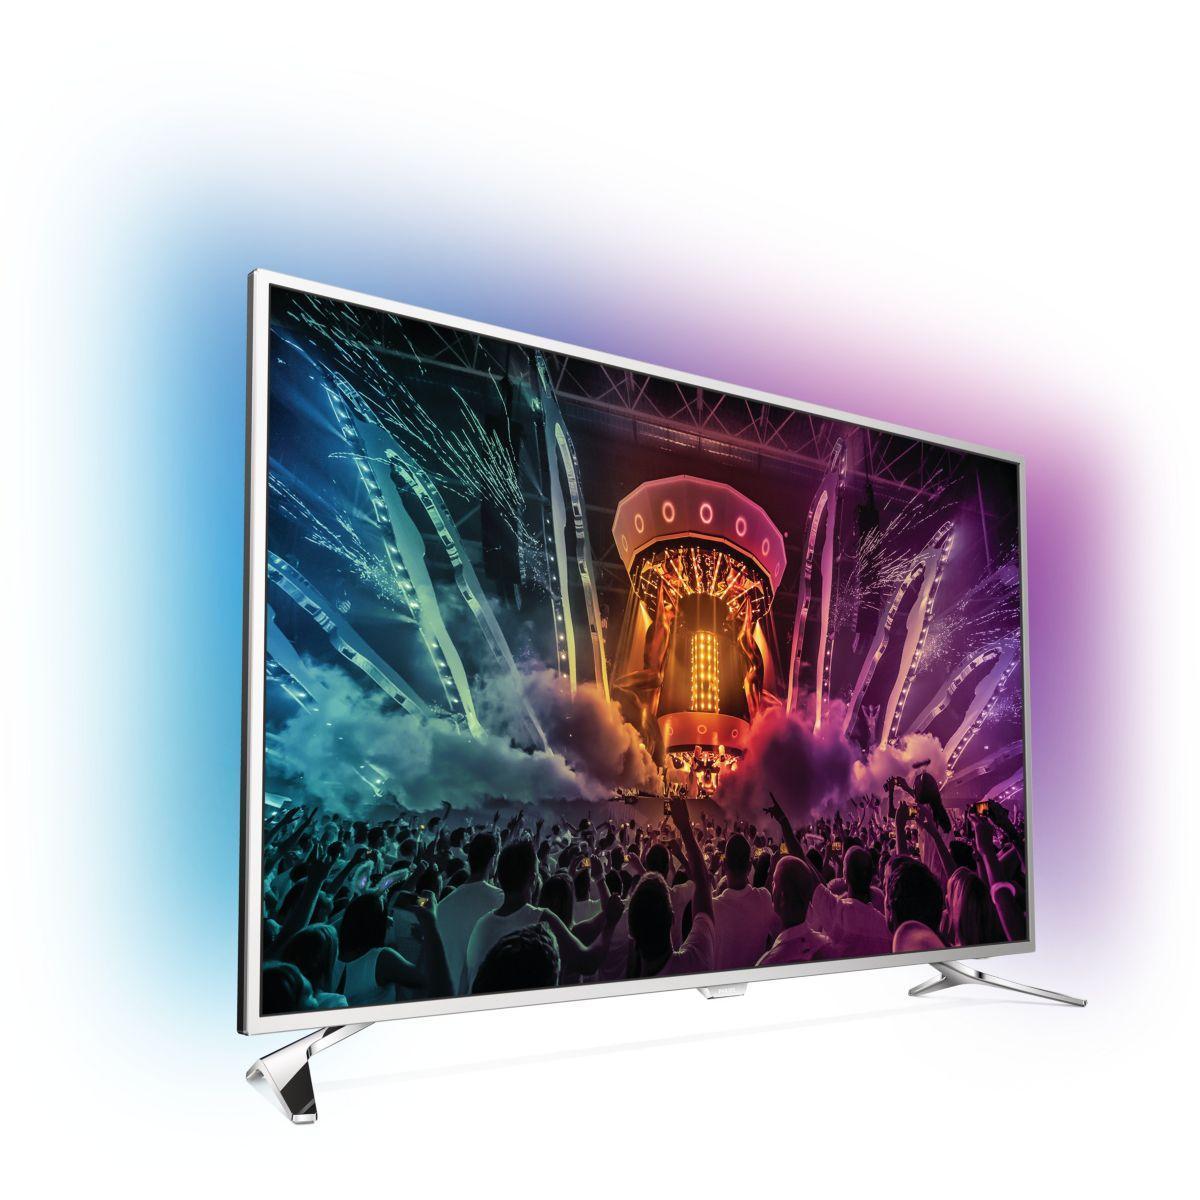 TV PHILIPS 55PUS6561 4K 1800 PPI SMART TV